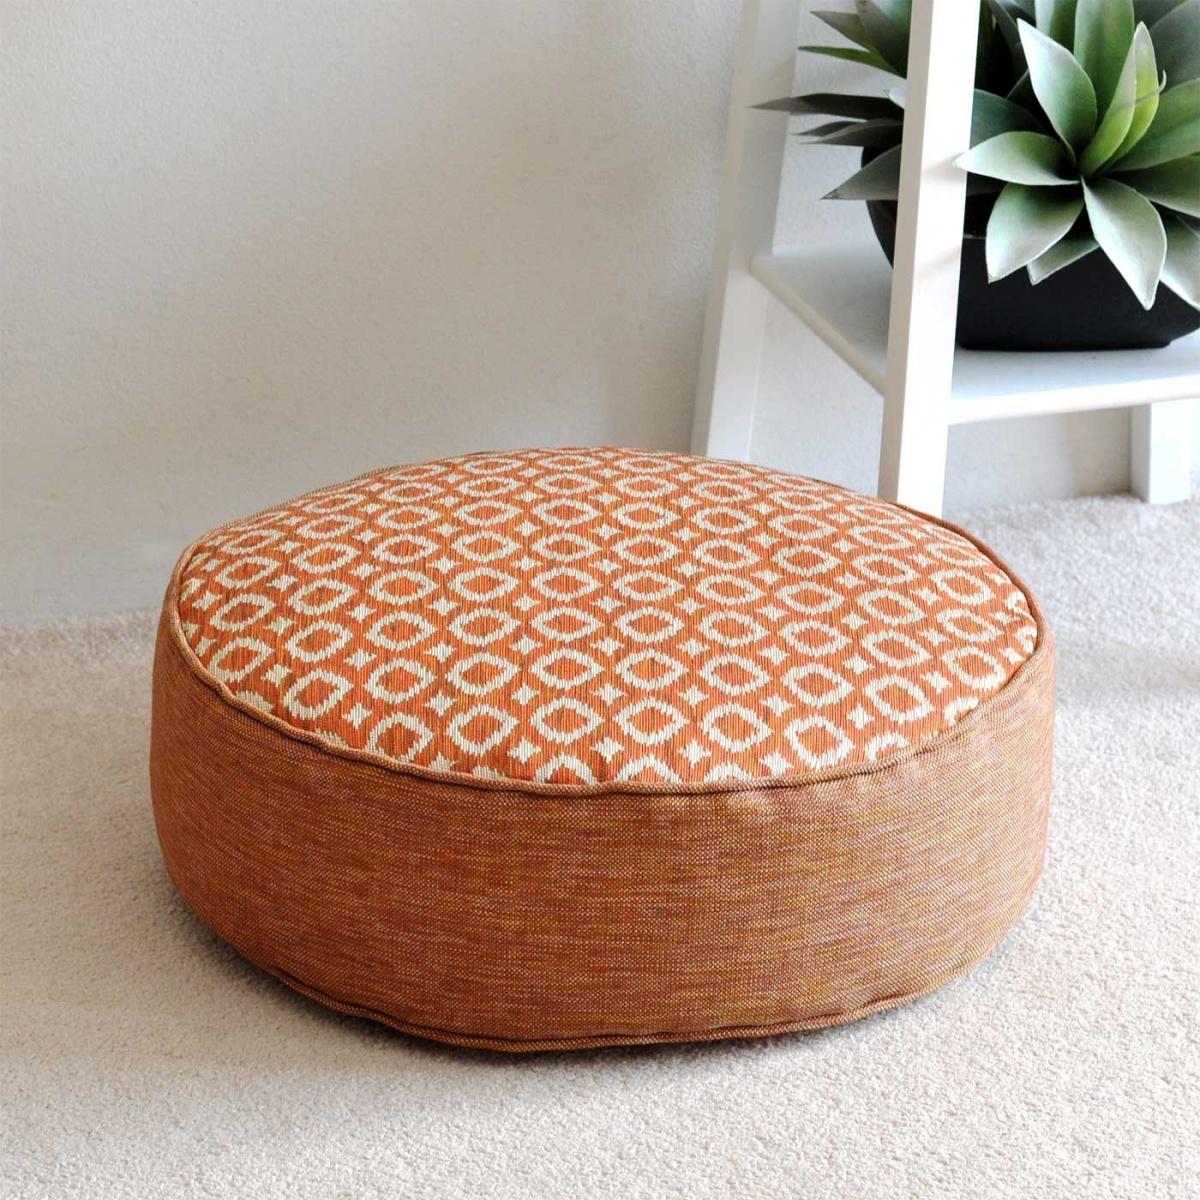 Ayana Tangerine Round Floor Cushion  45cm  Hupper